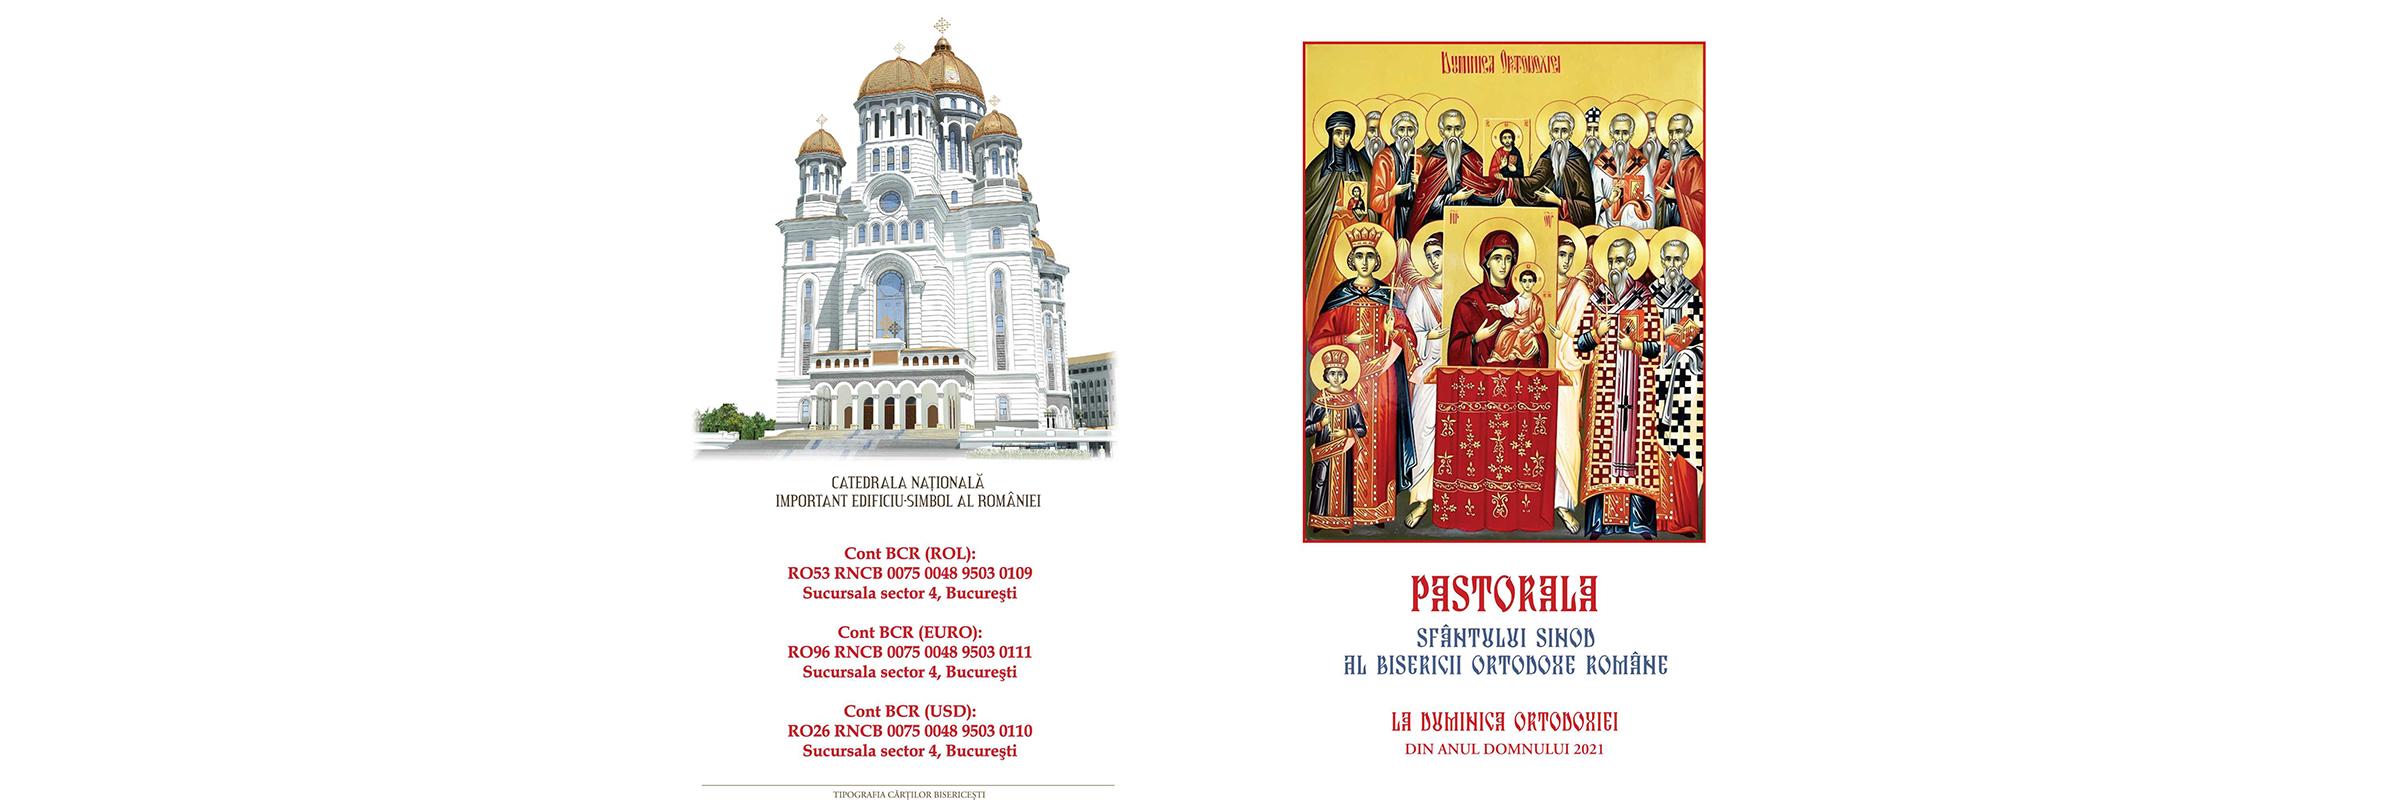 pastorala_site